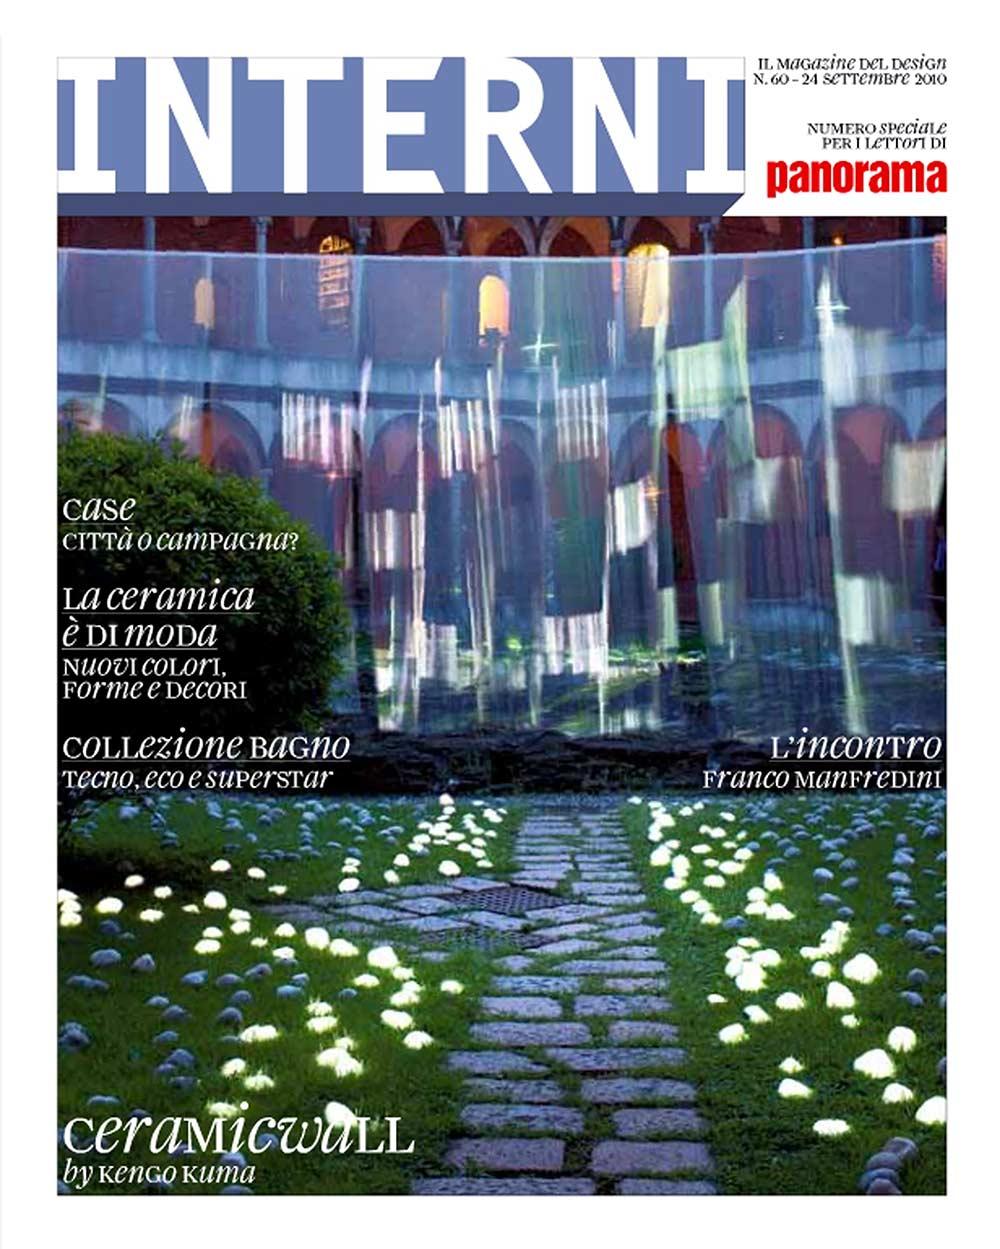 Panorama_interni_settebre-2010_copertina_low